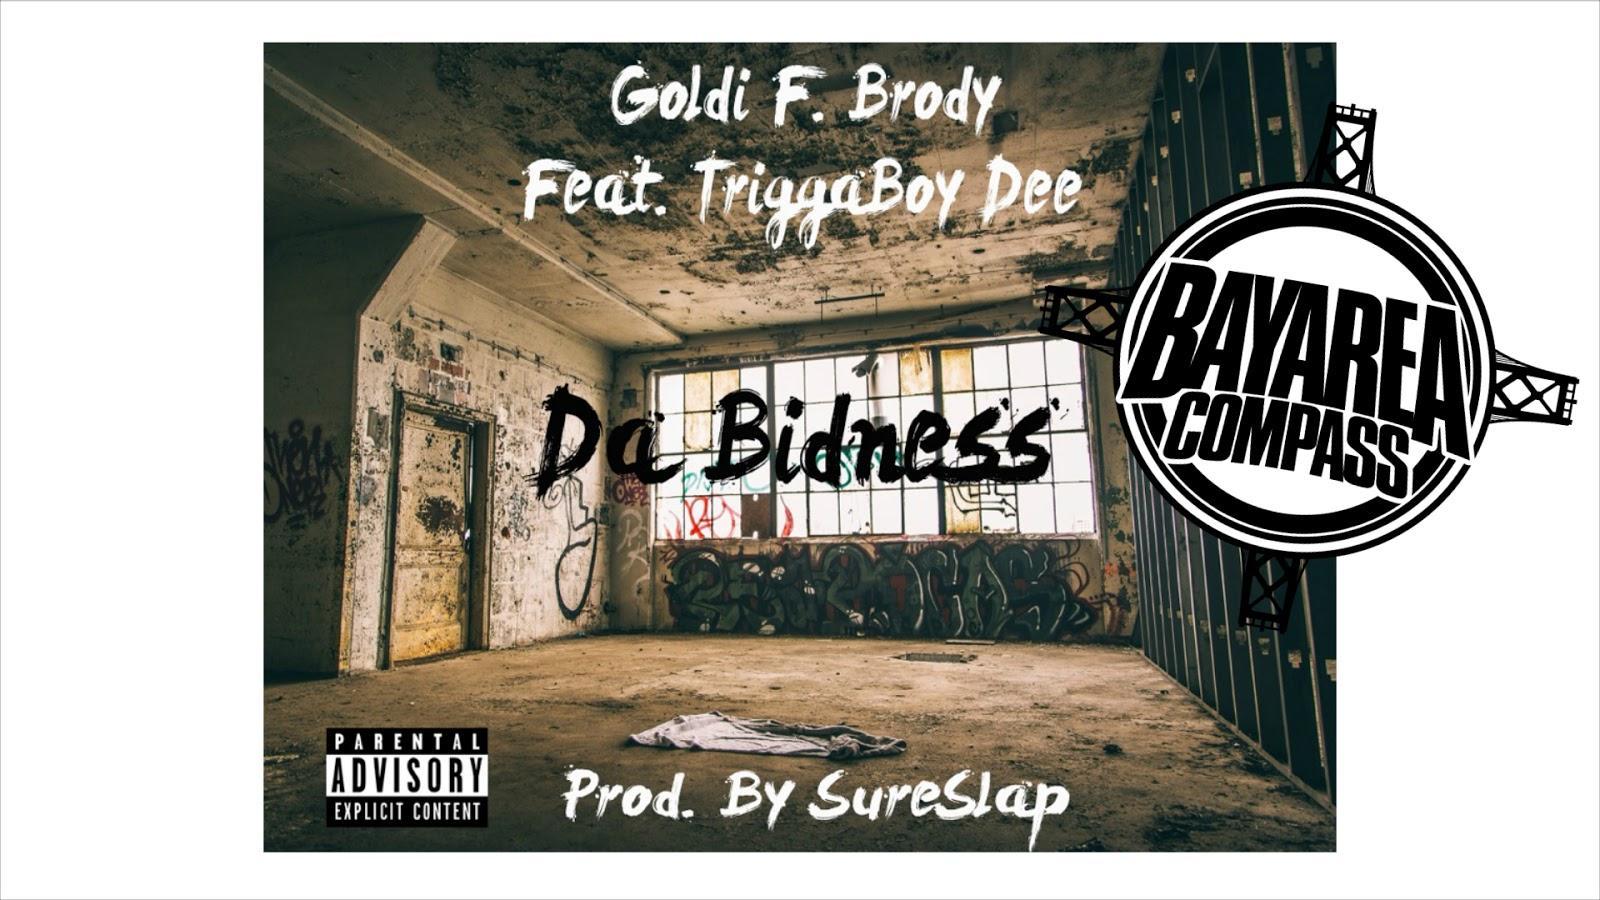 cbfd49b4d26 New Music  Da Bidness by Goldi F. Brody ft. TriggaBoy Dee (Prod. By  SureSlap)  TrapCityGOLDI